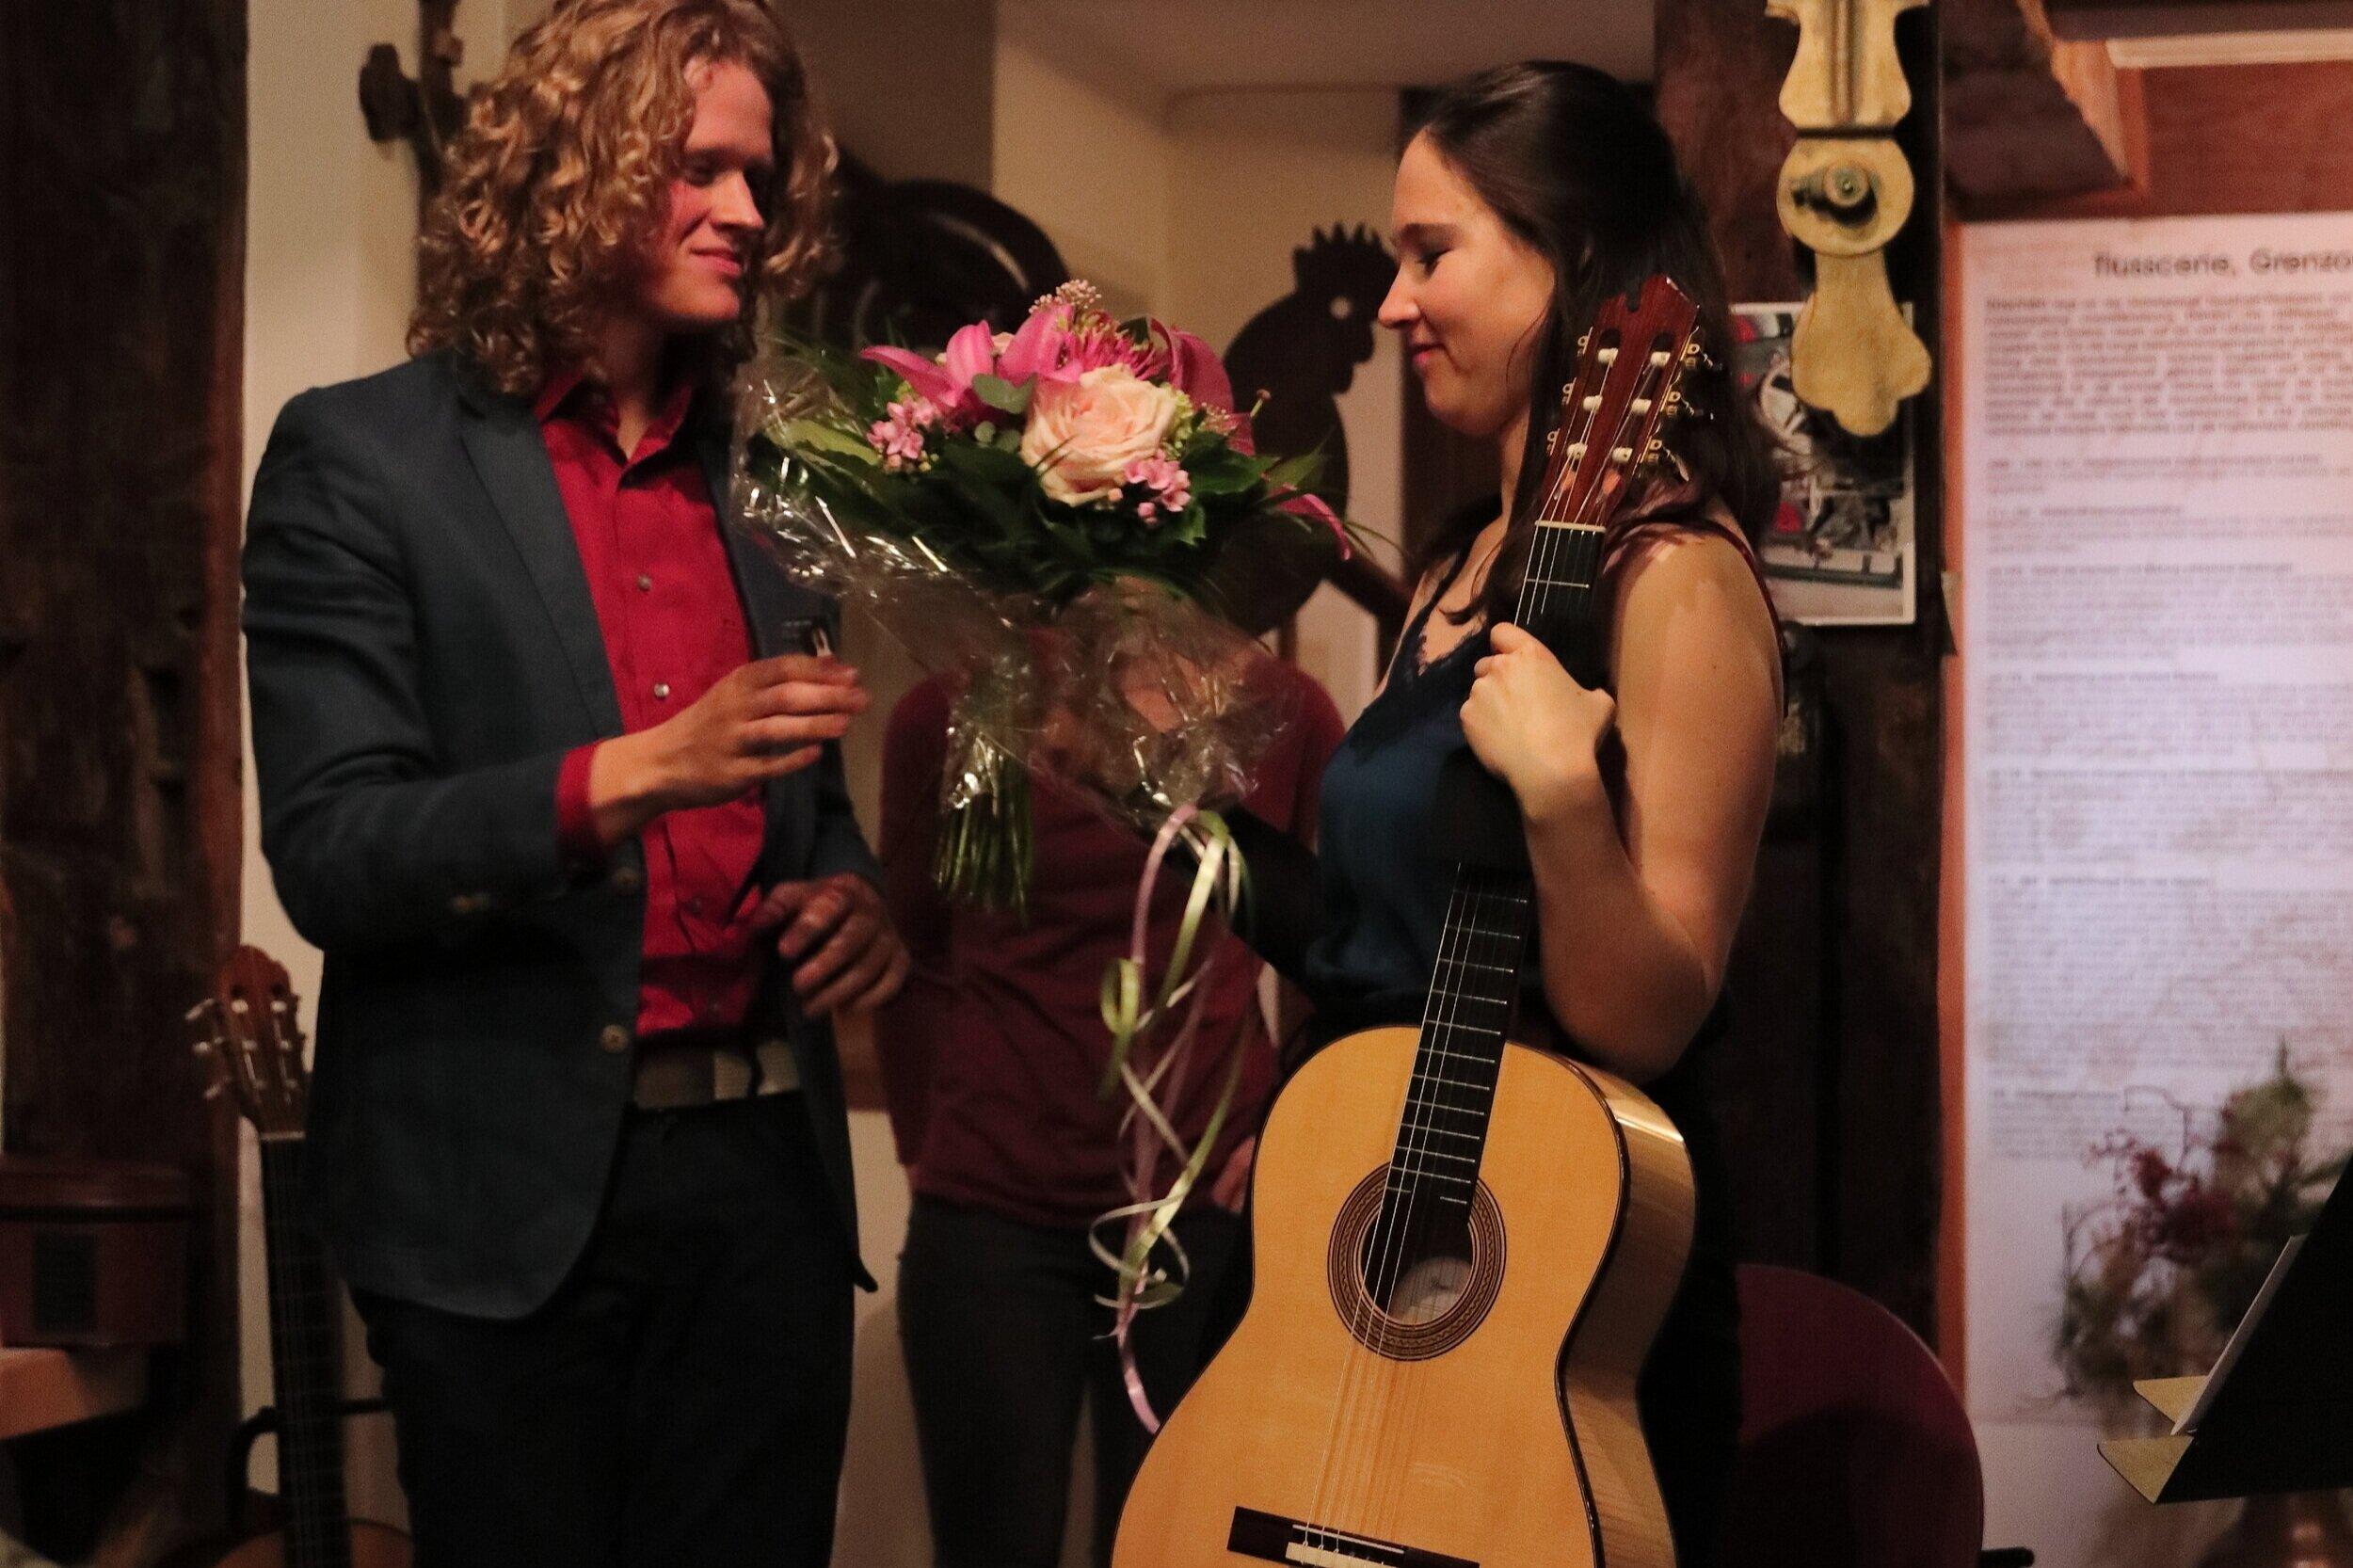 2e edition of Den Toom Luthier Concert series with Elke Prinsier, Züschen, Germany